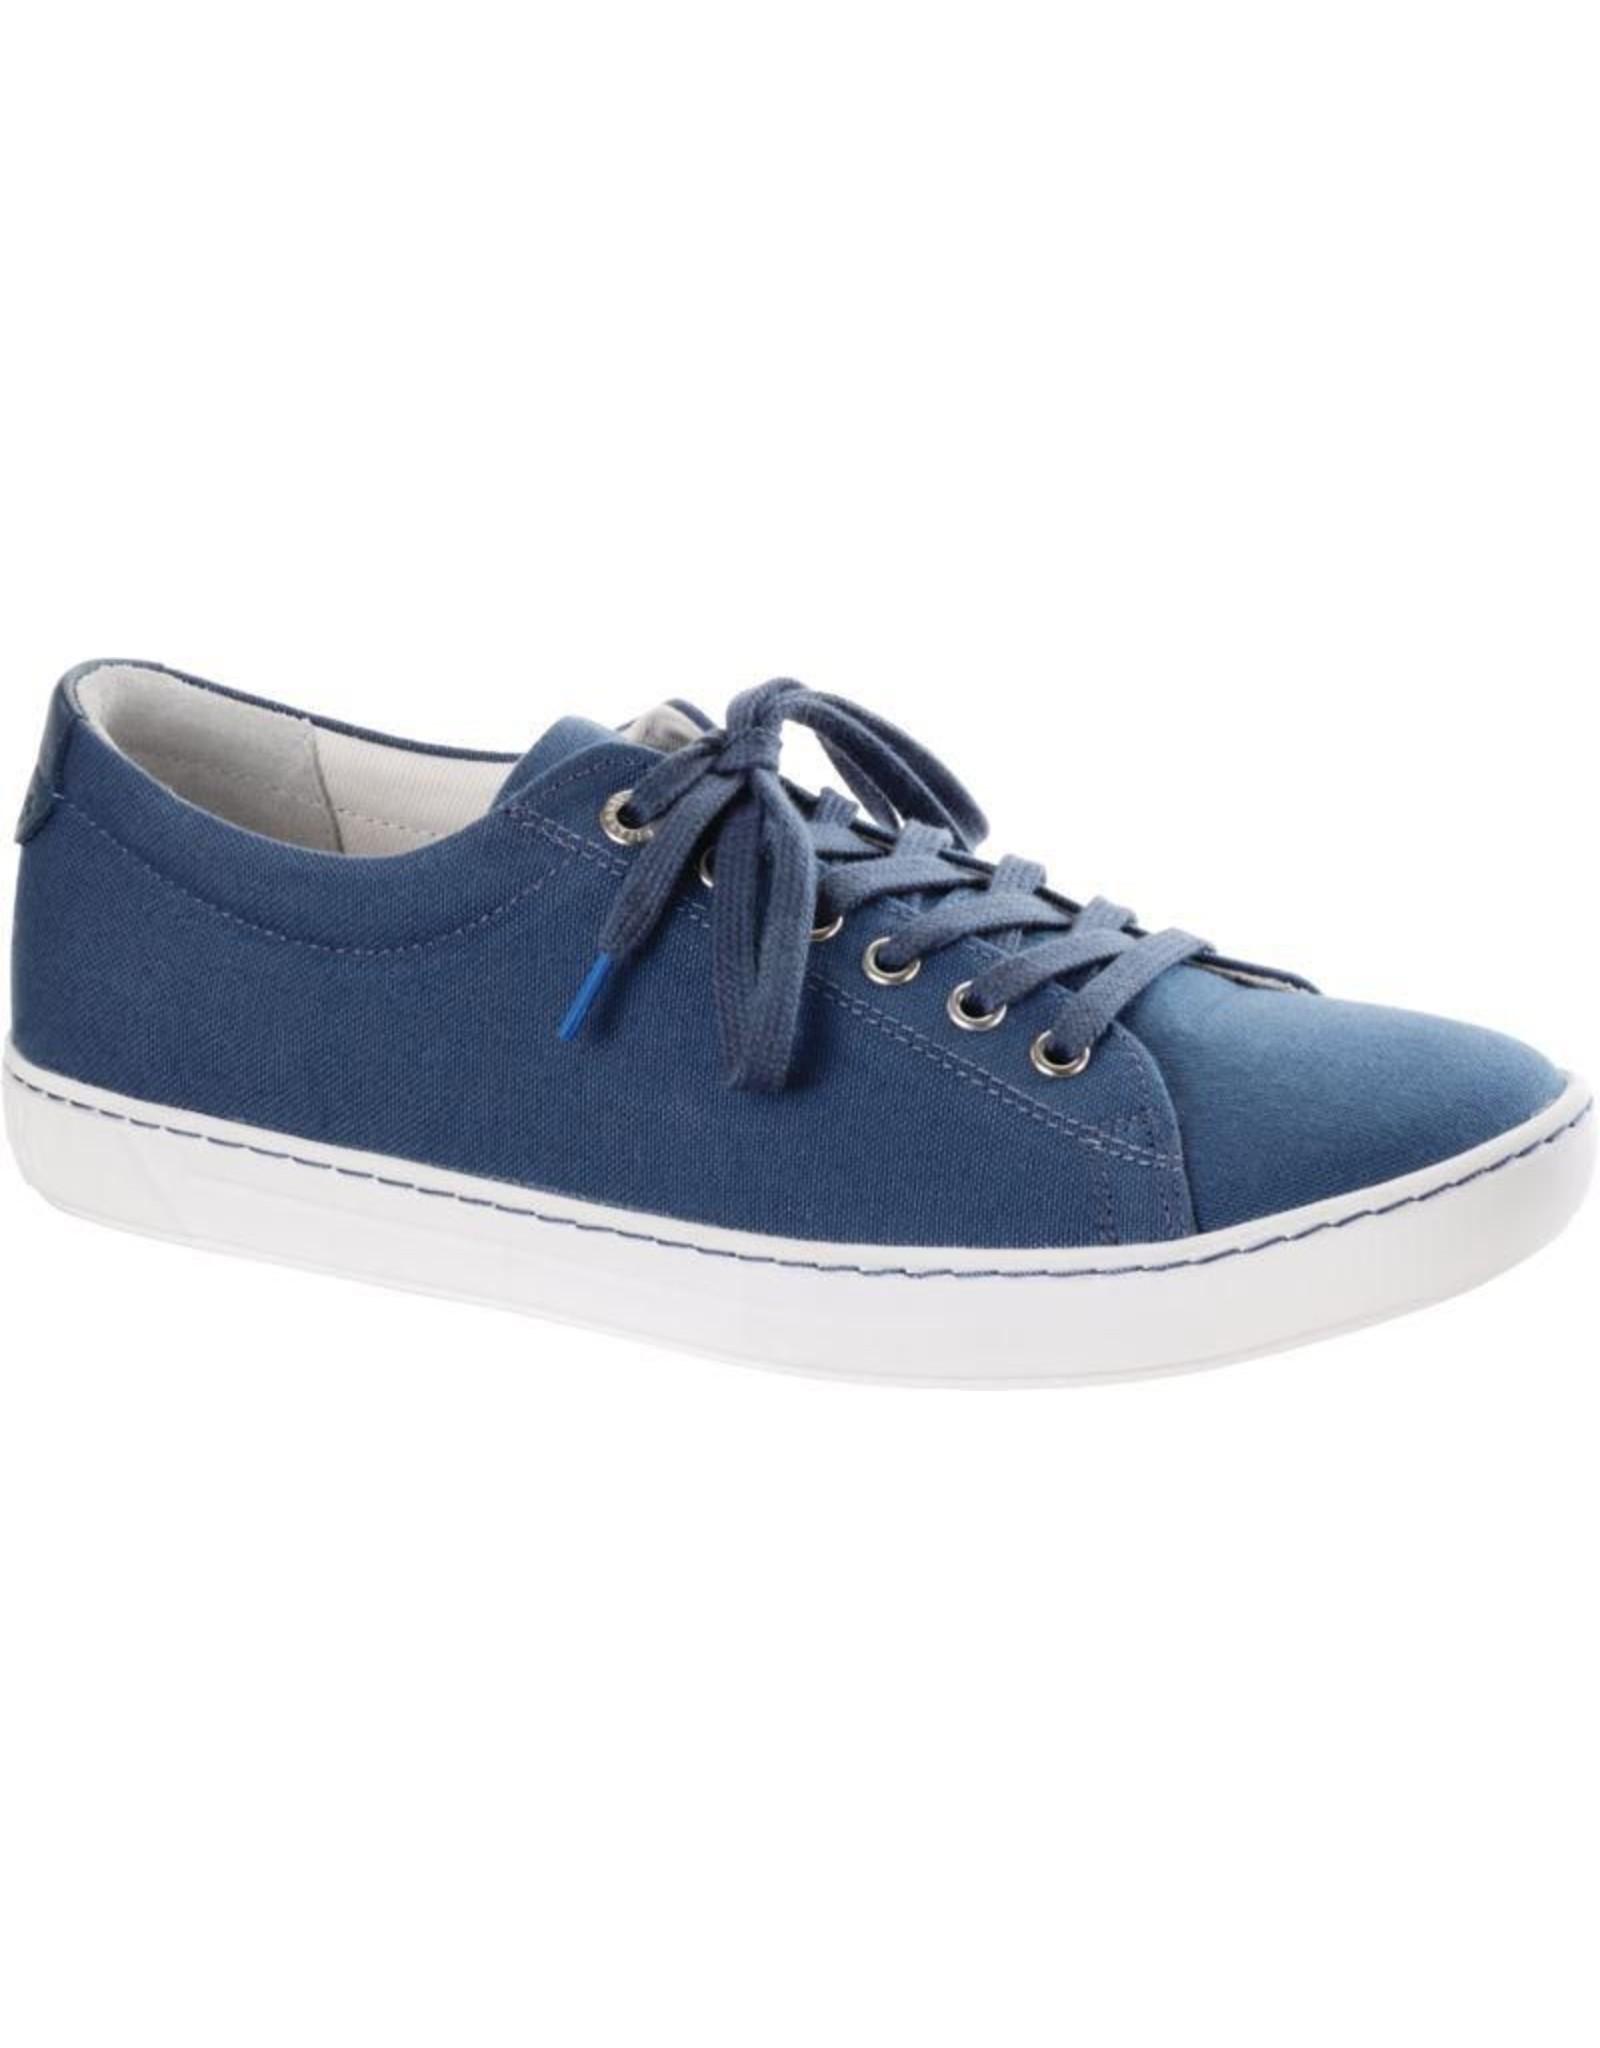 Birkenstock Arran Canvas Shoe